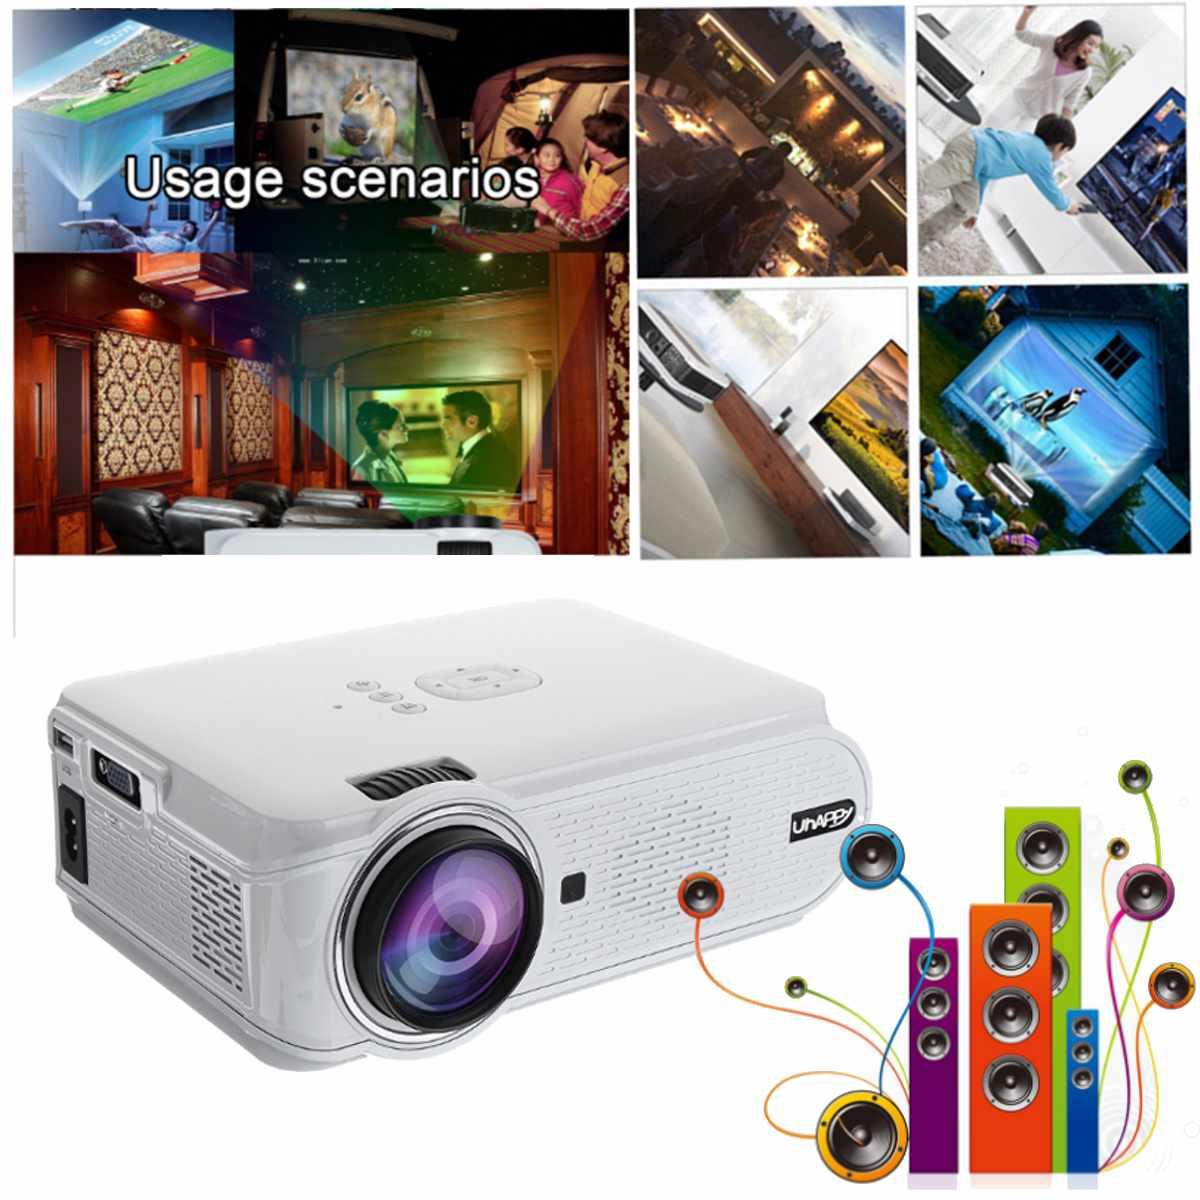 Portátil hd 1080 p vídeo beamer led mini projetores 7000lm feixe de vídeo de cinema em casa 4 k para jogos de vídeo de cinema em casa smartphones